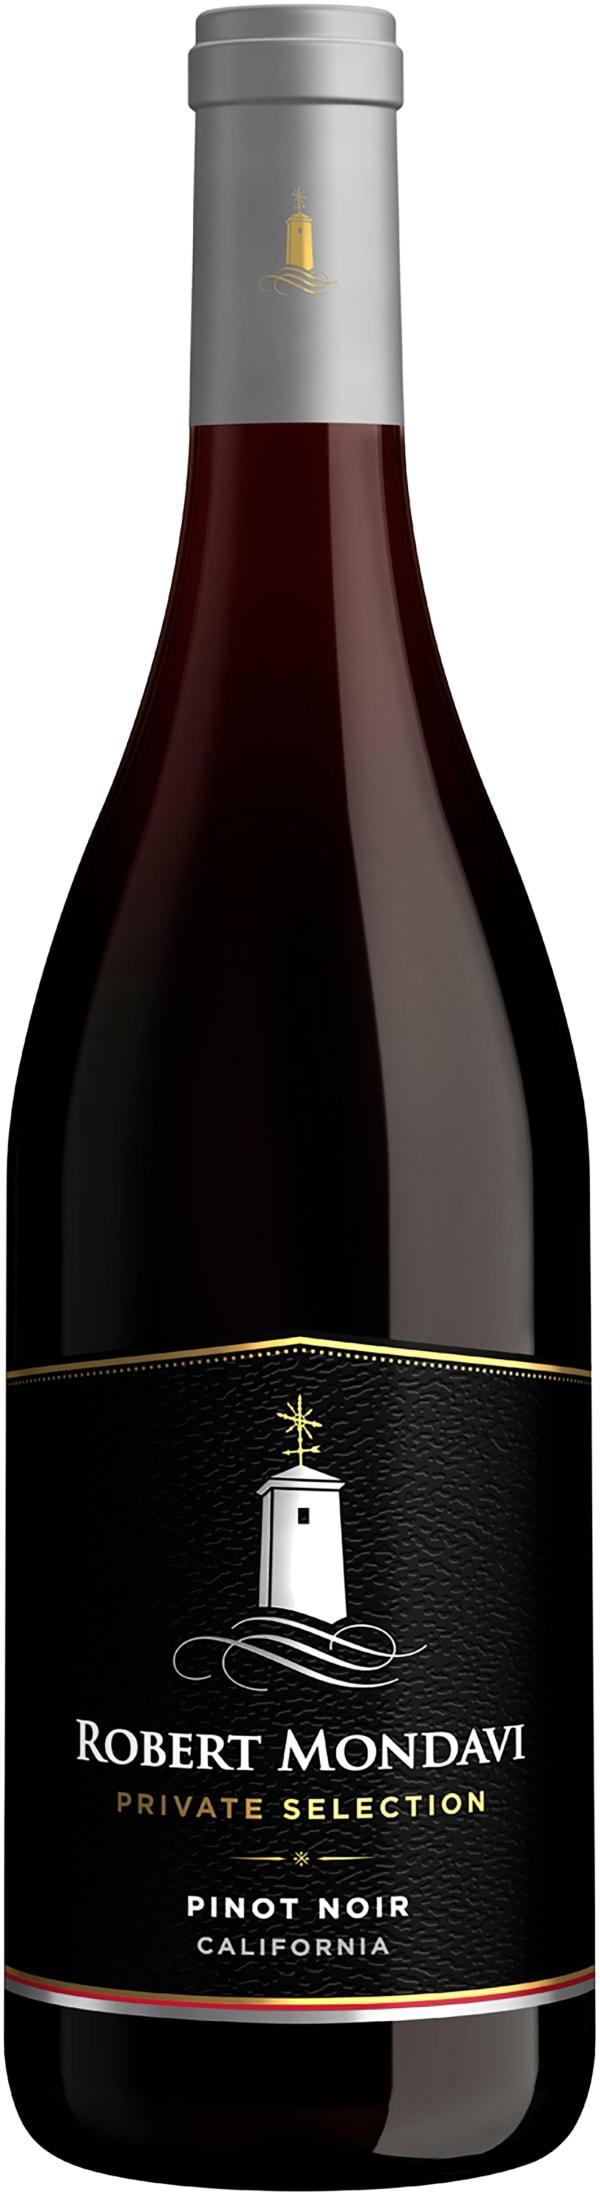 Robert Mondavi Private Selection Pinot Noir 2019